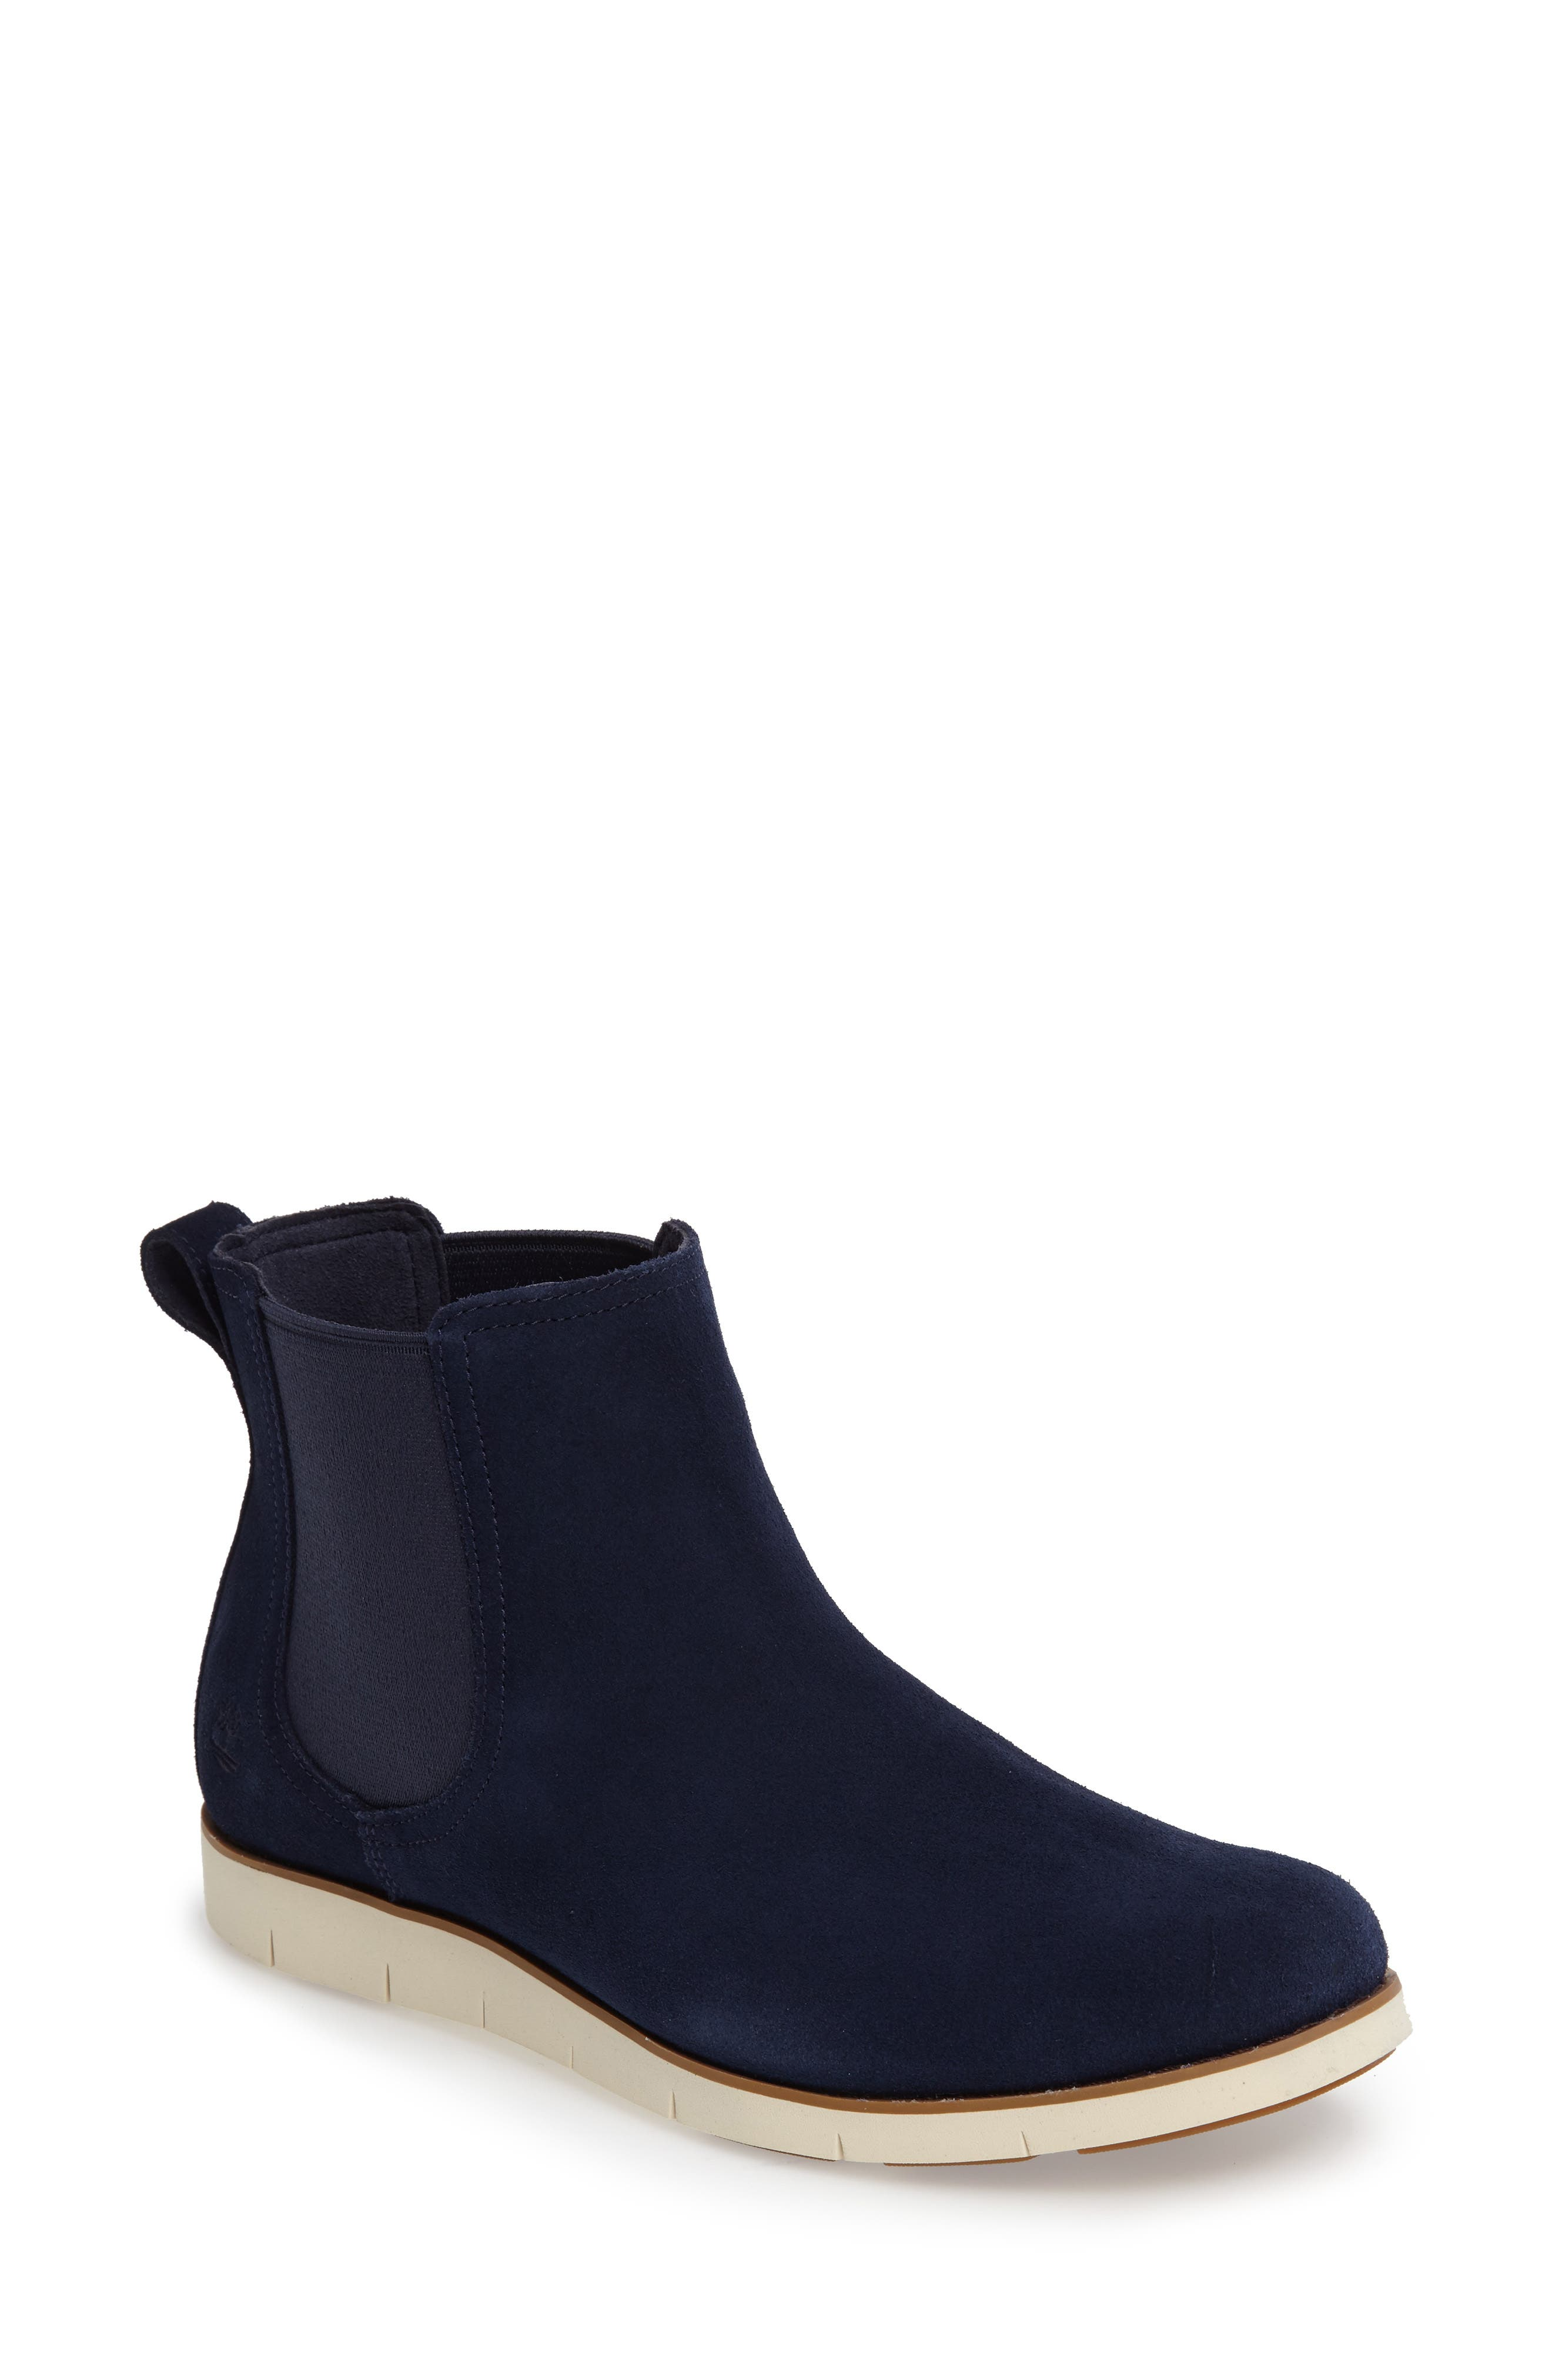 Lakeville Chelsea Boot,                         Main,                         color, 001